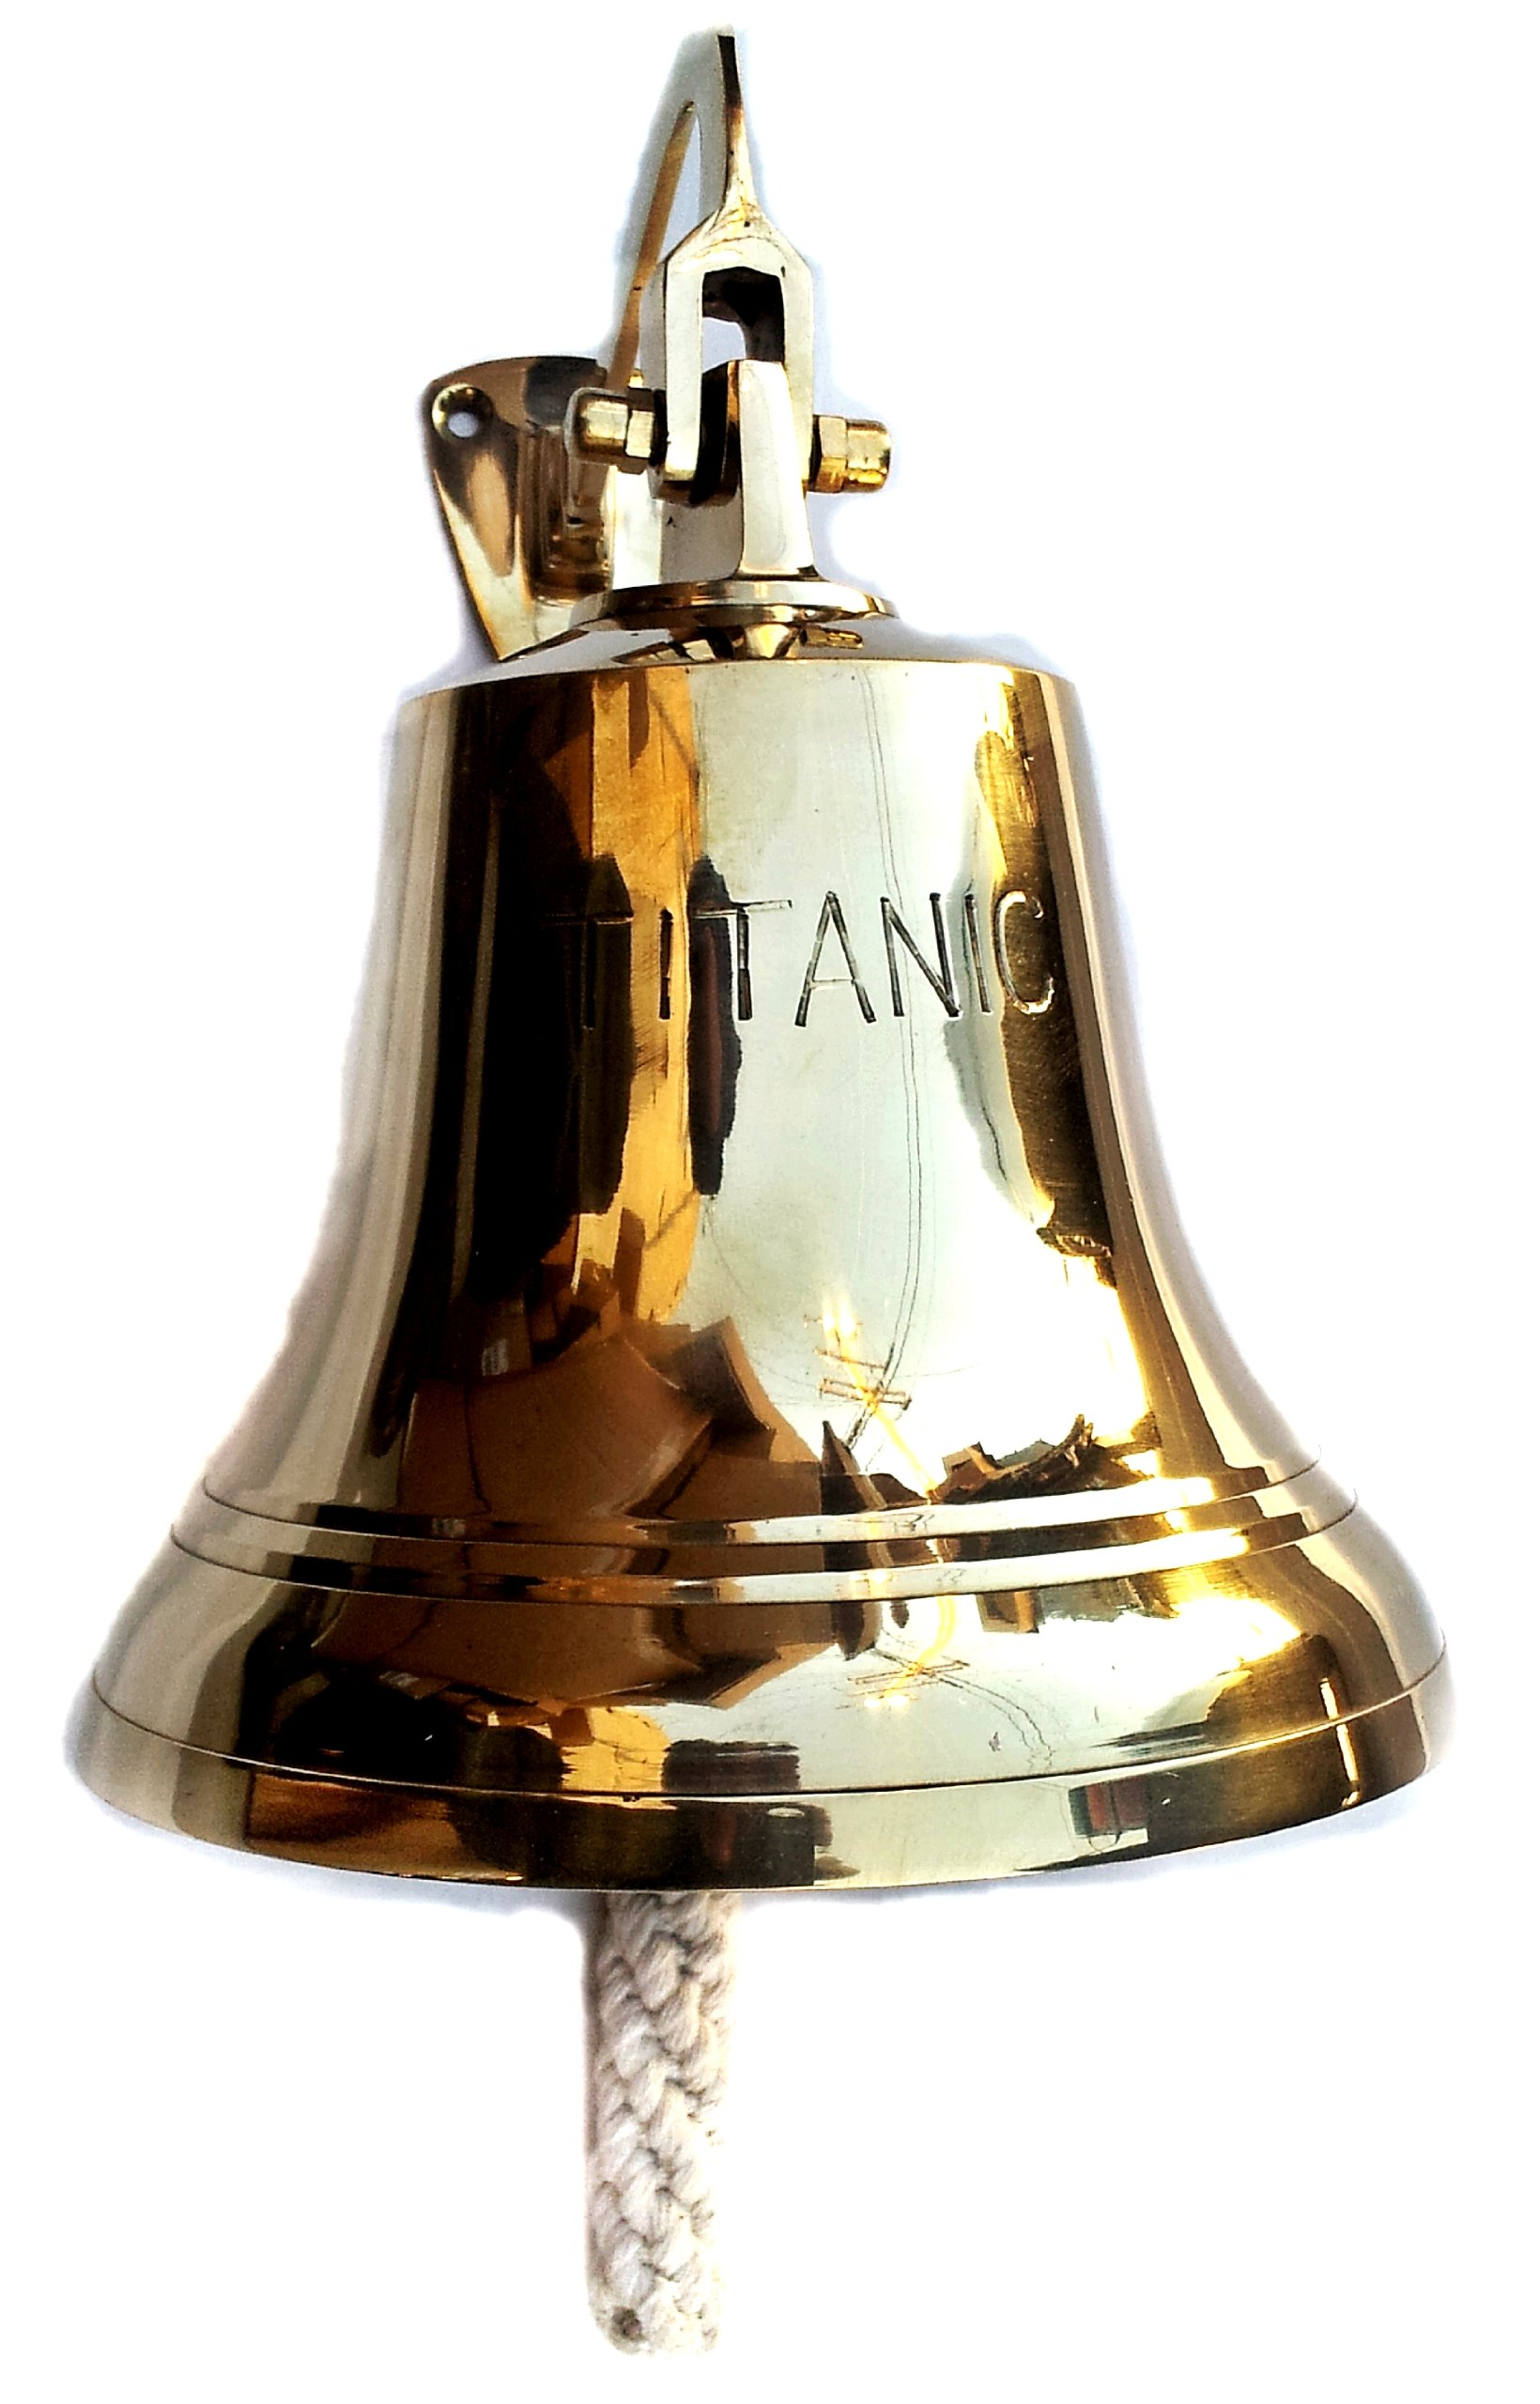 Brass Bell Titanic 6'' Nautical Ship Boat Decor